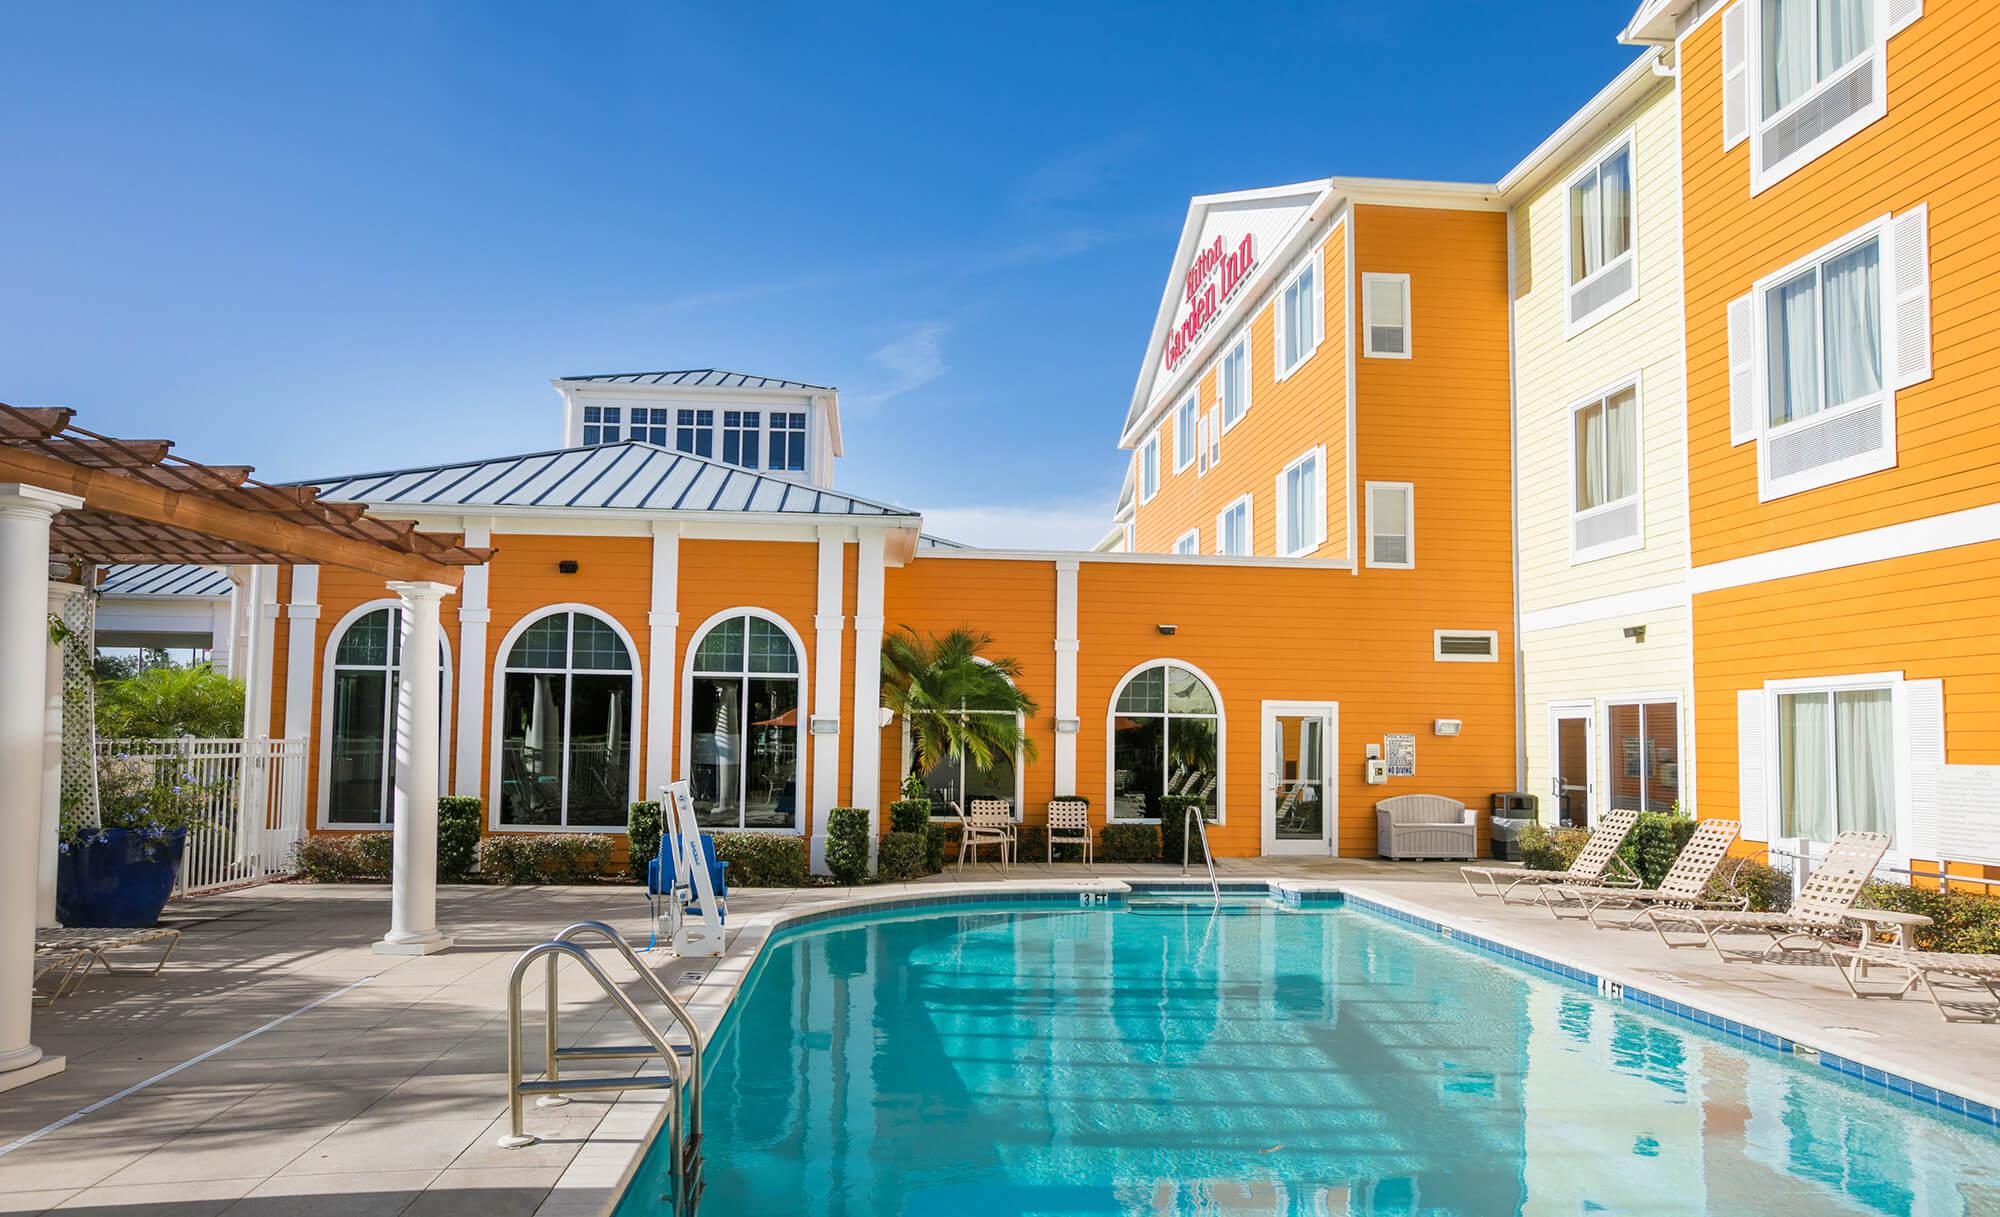 Pool and hotel exterior at Hilton Garden Inn Lakeland